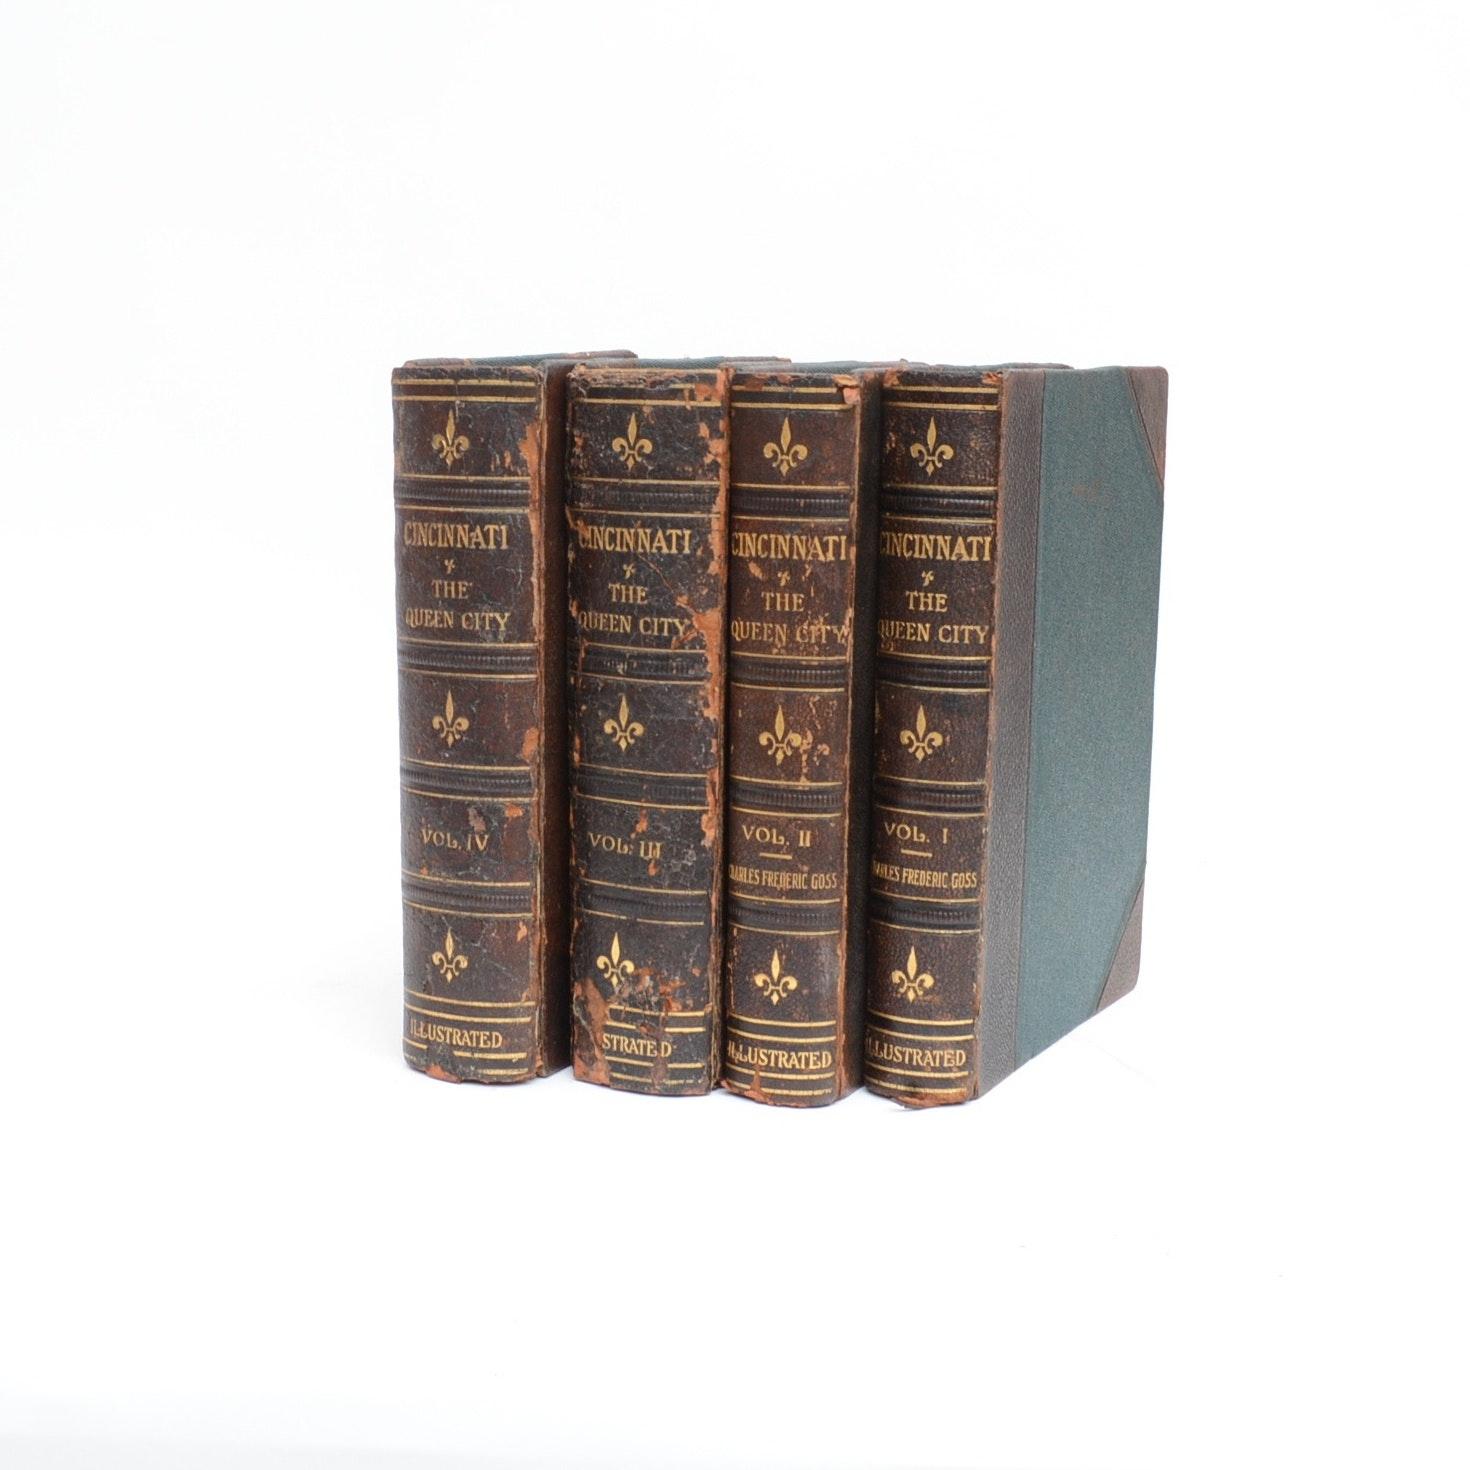 "1912 ""Cincinnati The Queen City"" by Rev. Charles Goss, Four Volume Set"